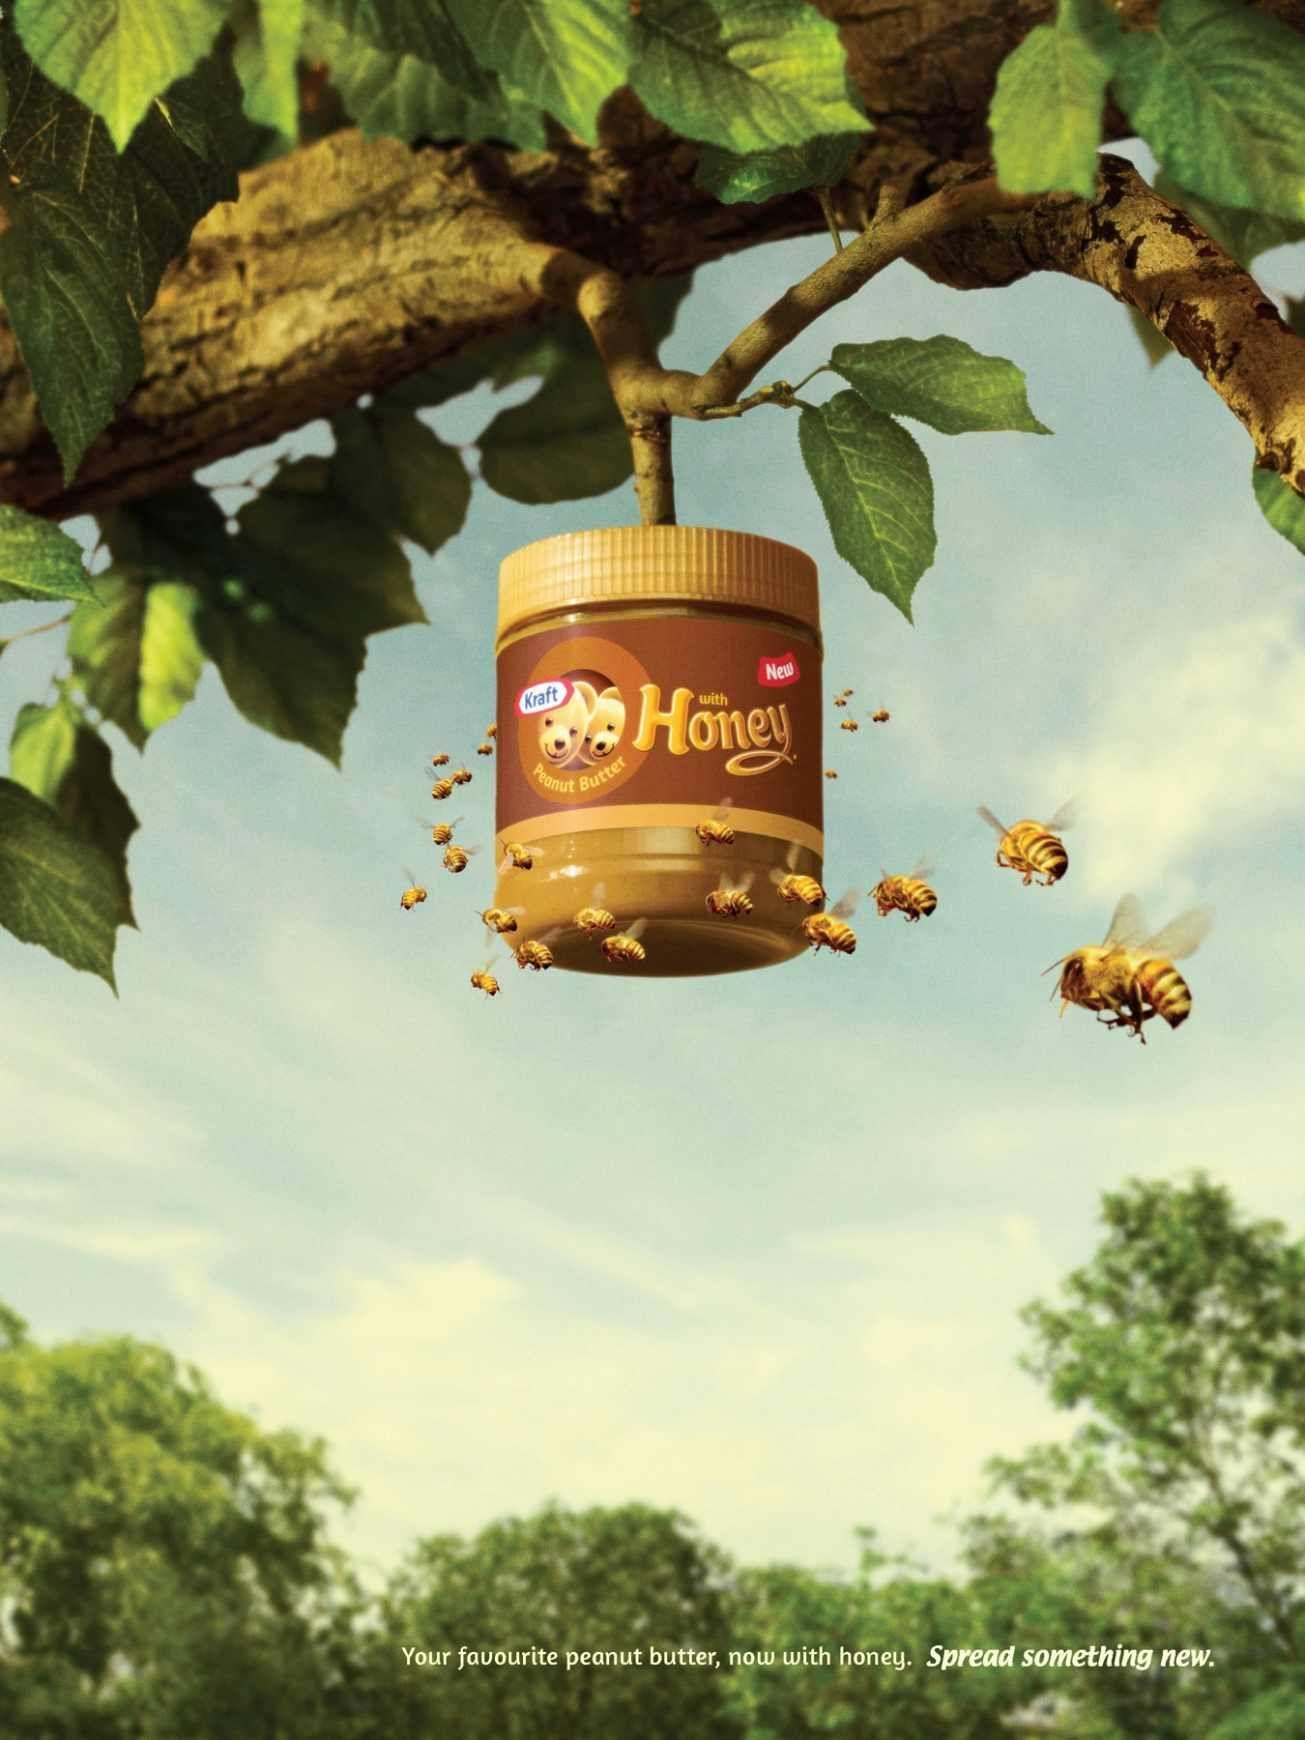 Kraft Peanut Butter with Honey: Beehive